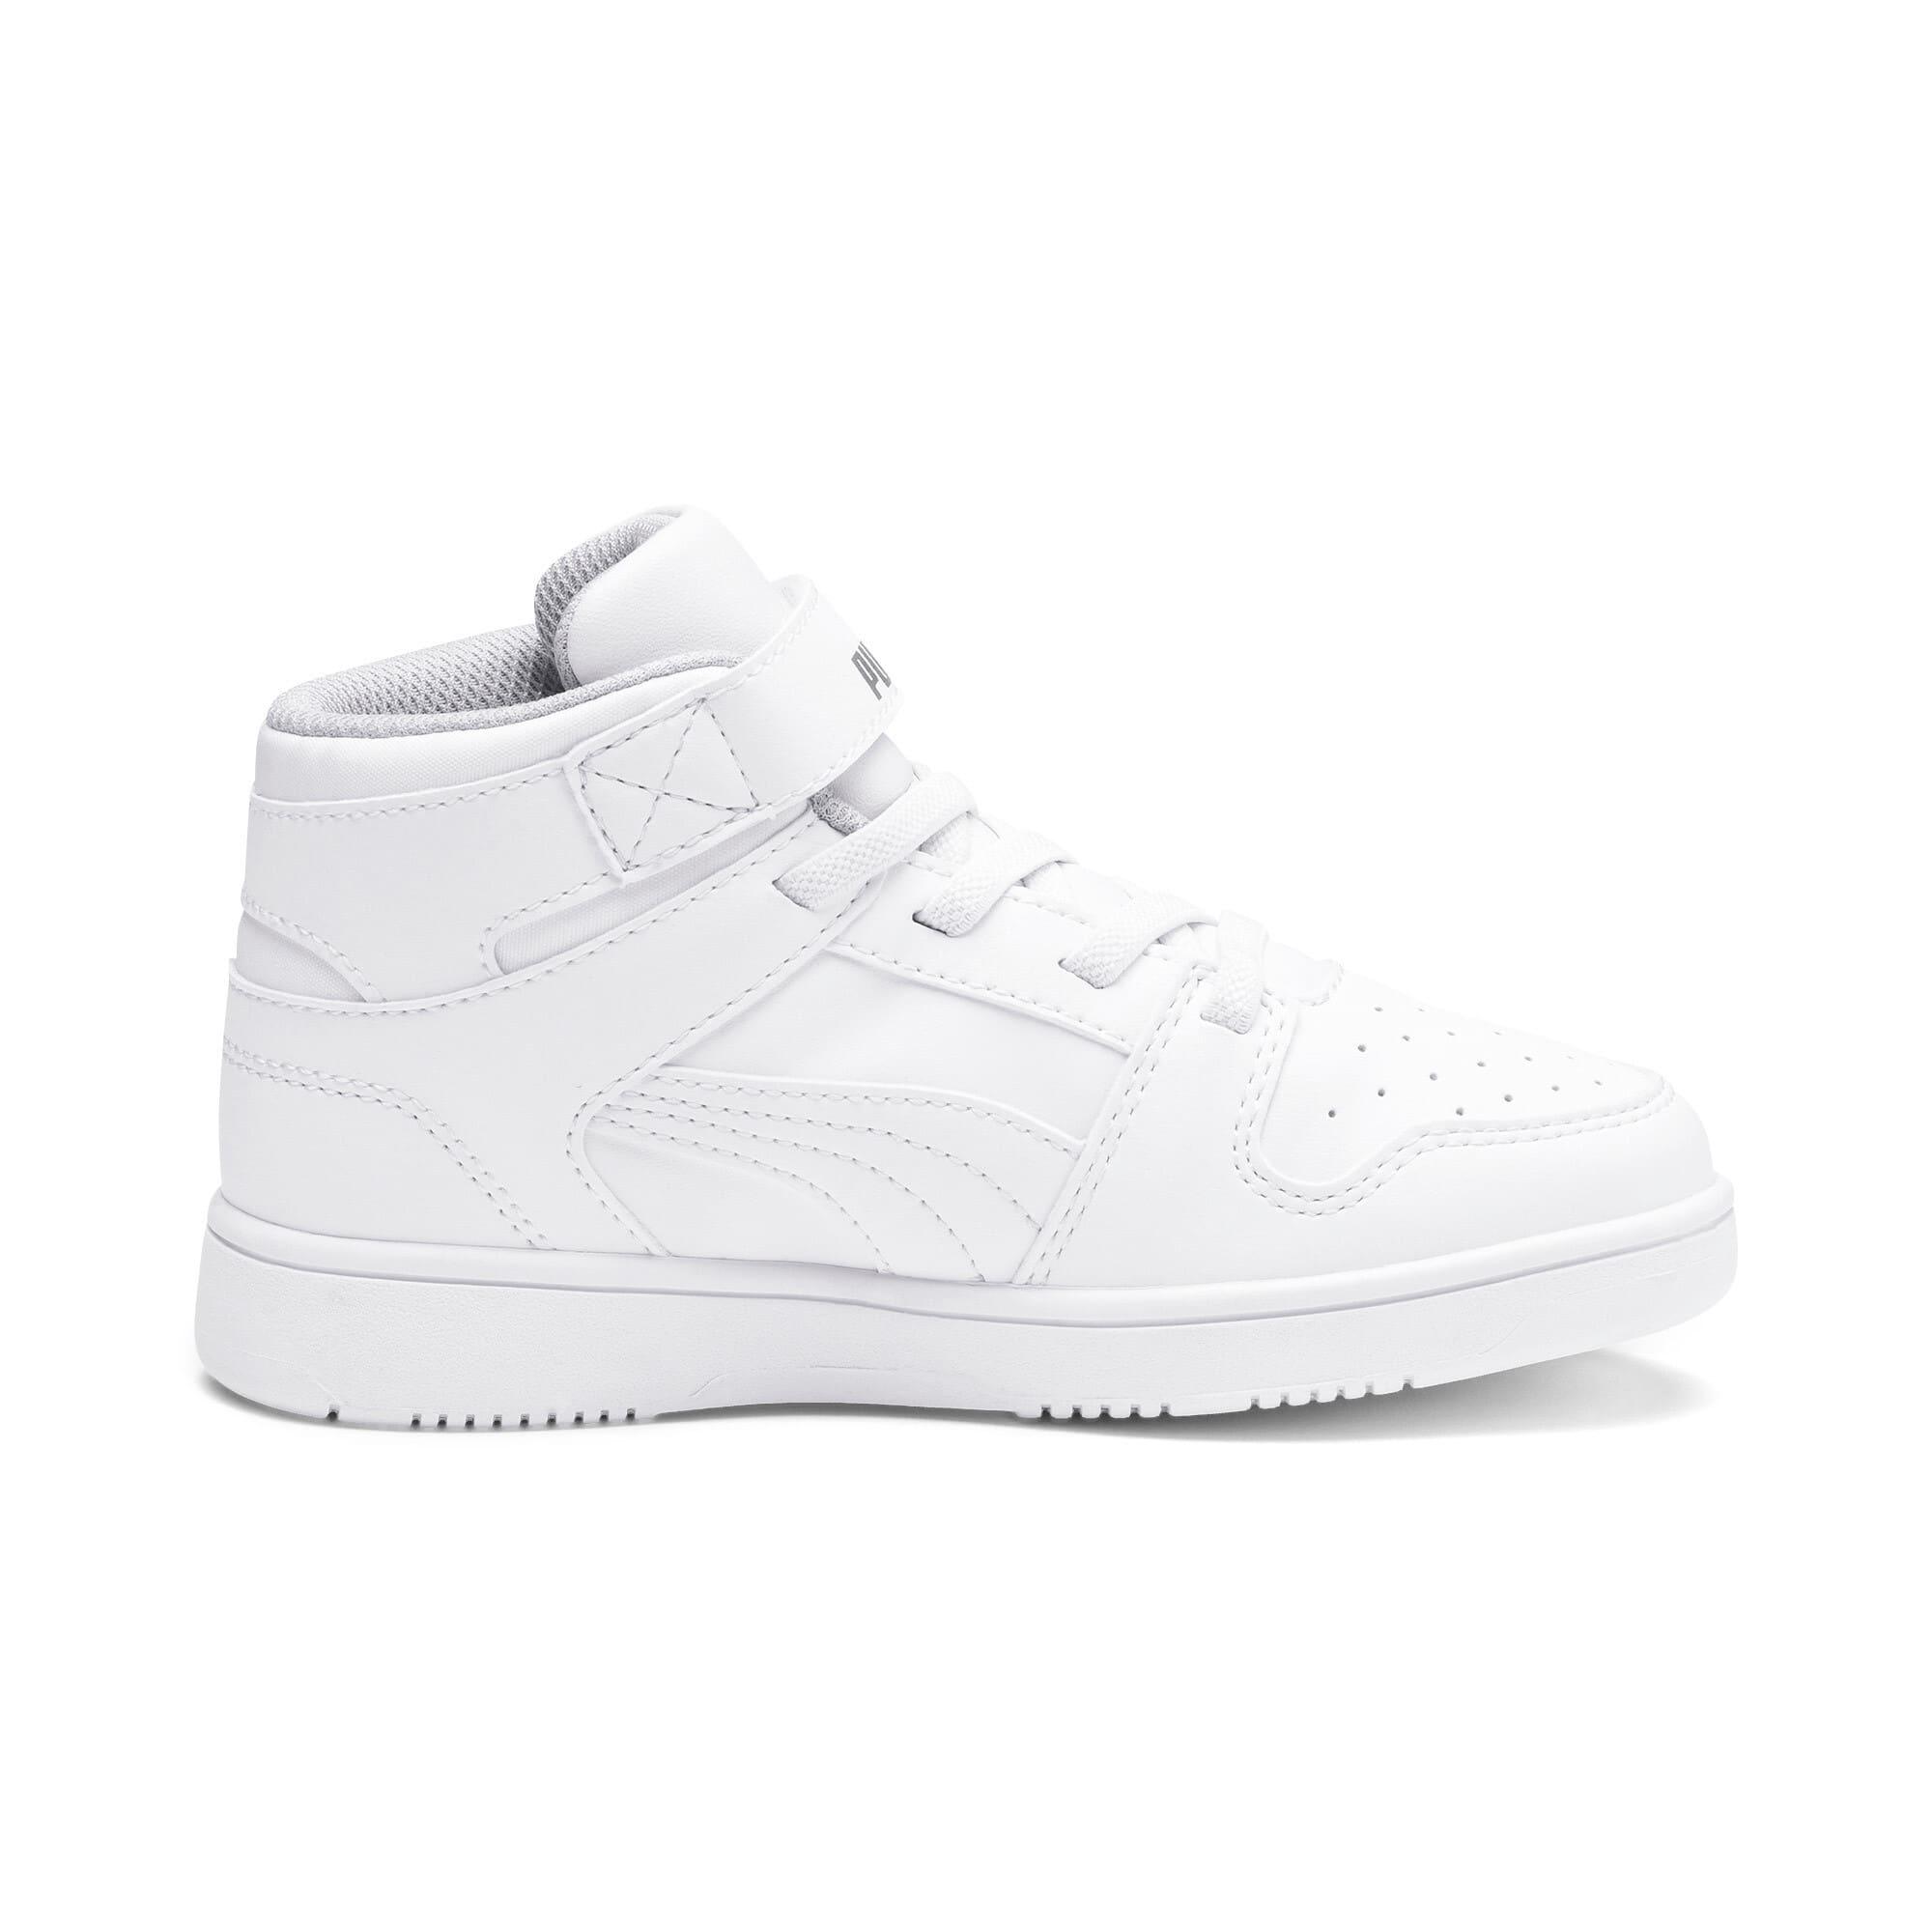 Thumbnail 5 of Rebound Lay-Up SL V Kids Sneaker, Puma White-Gray Violet, medium